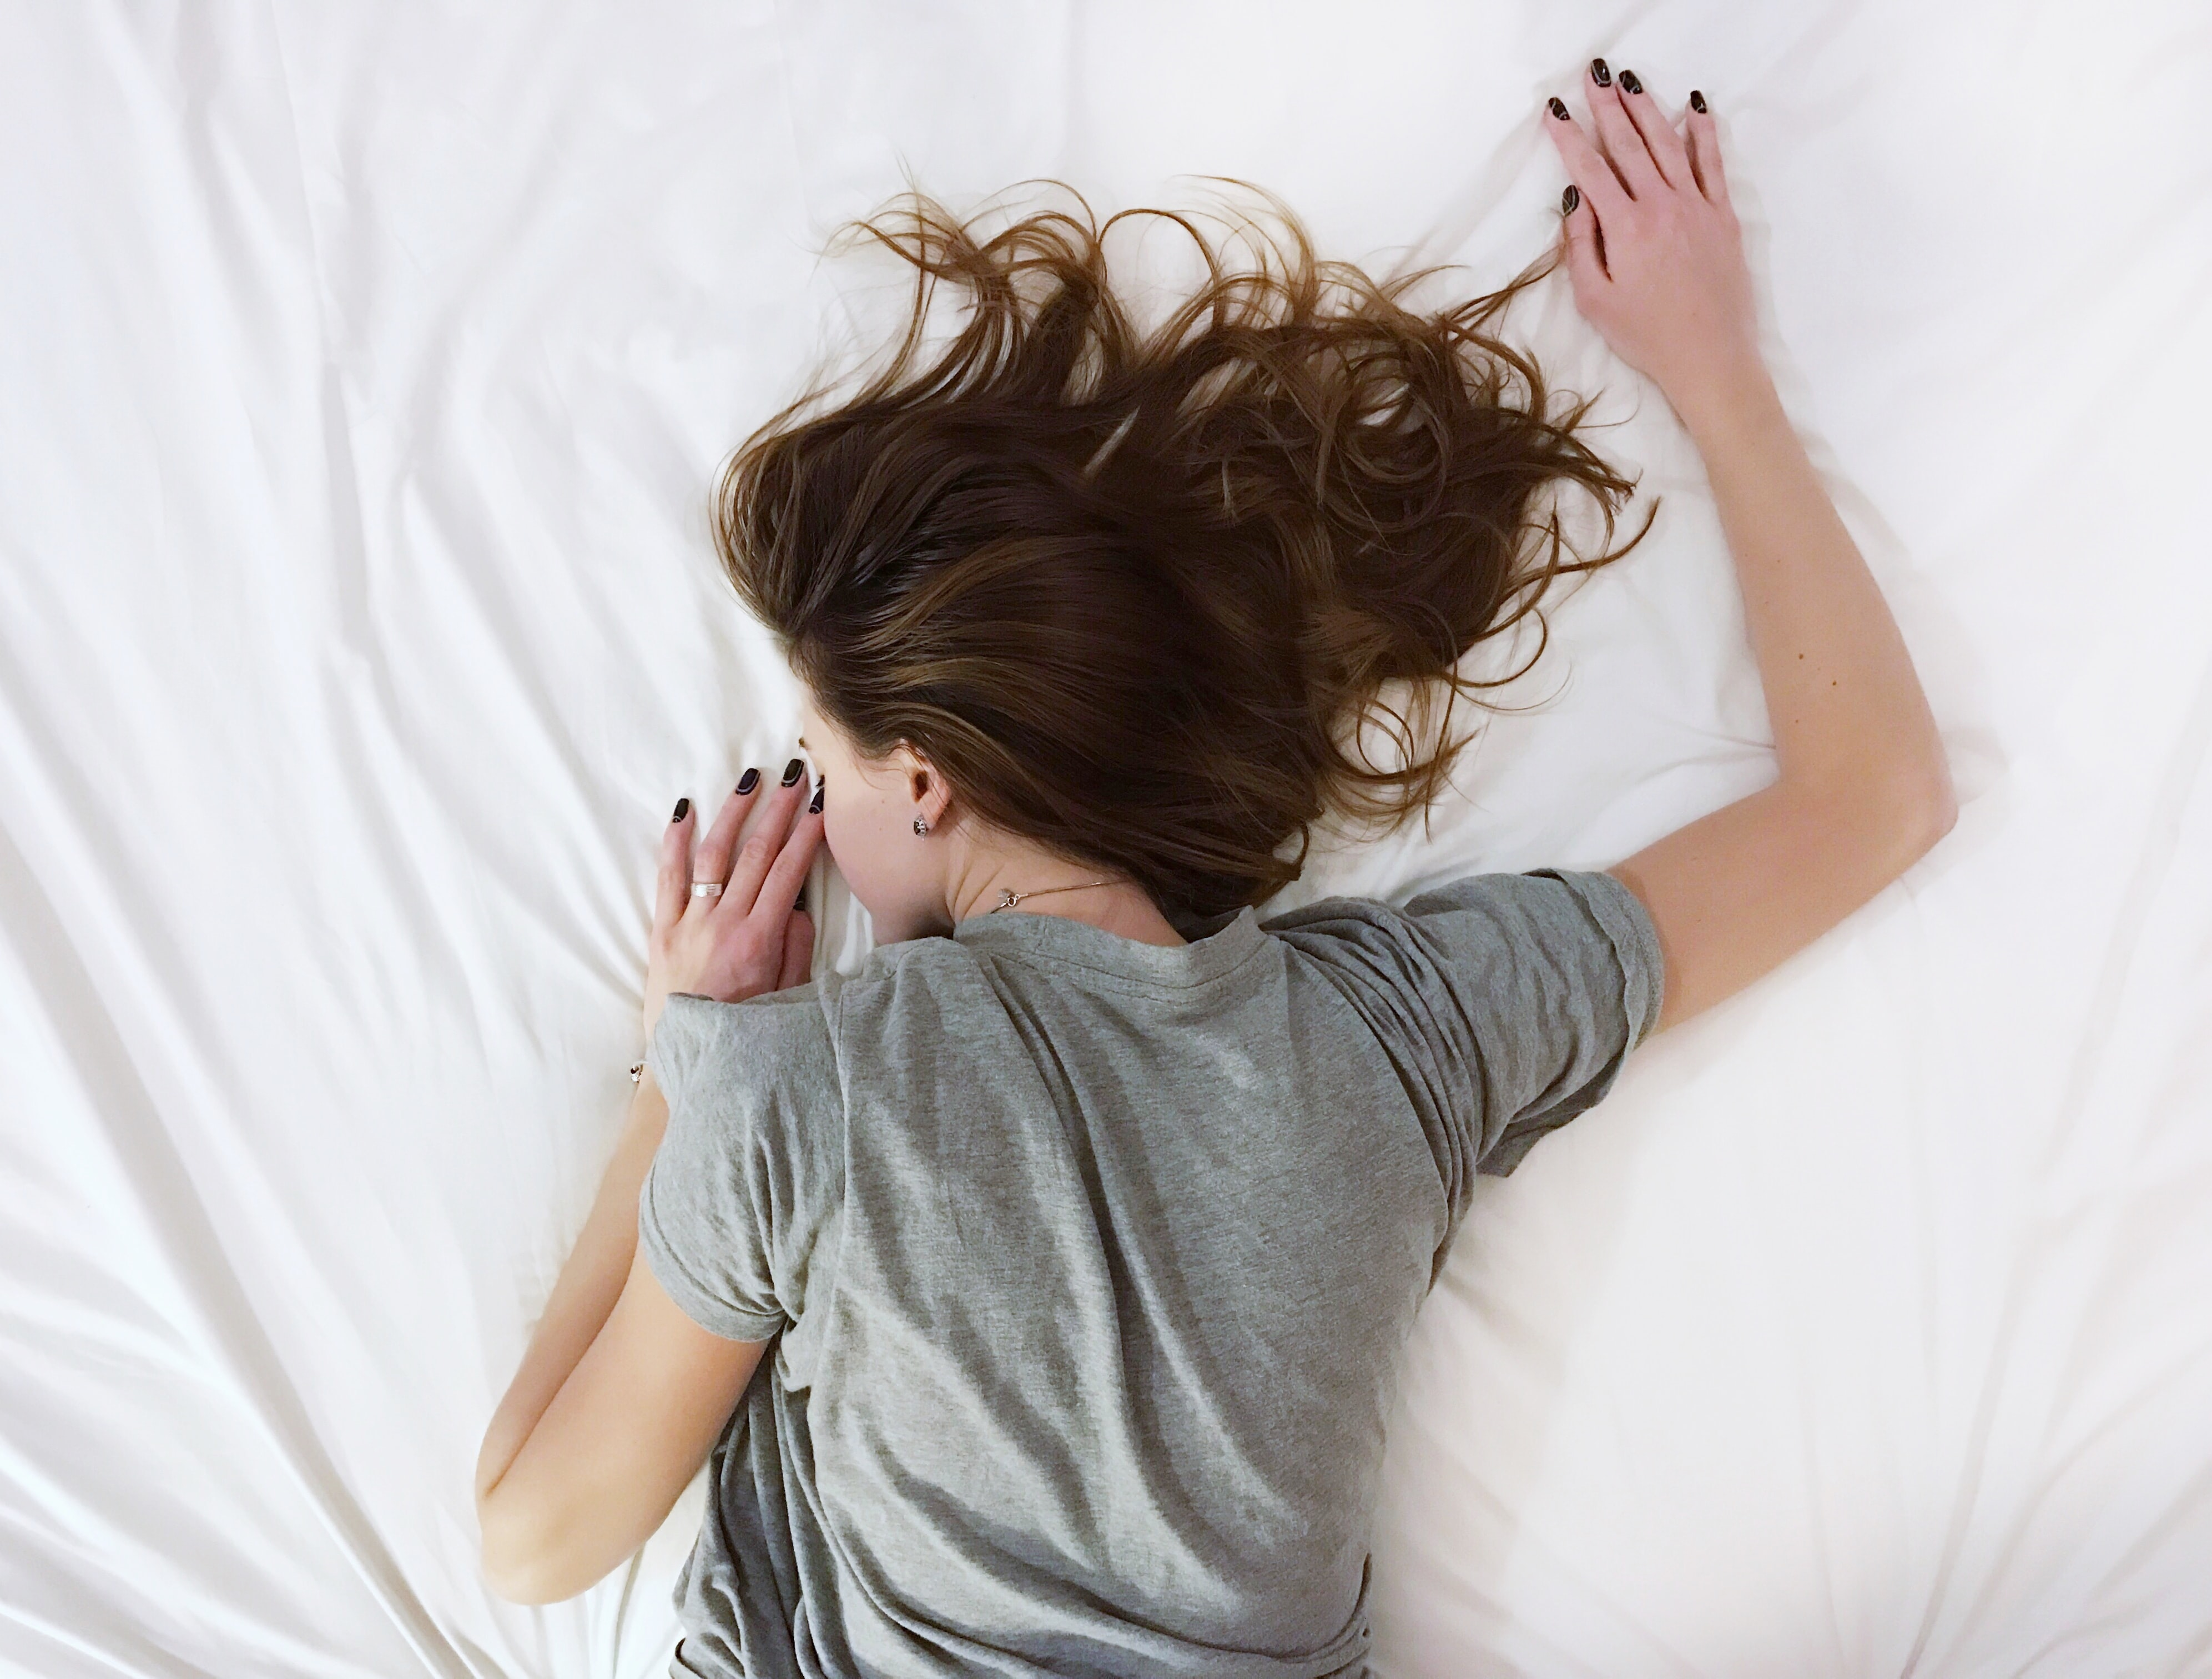 sleep apnea and heart disease relationship